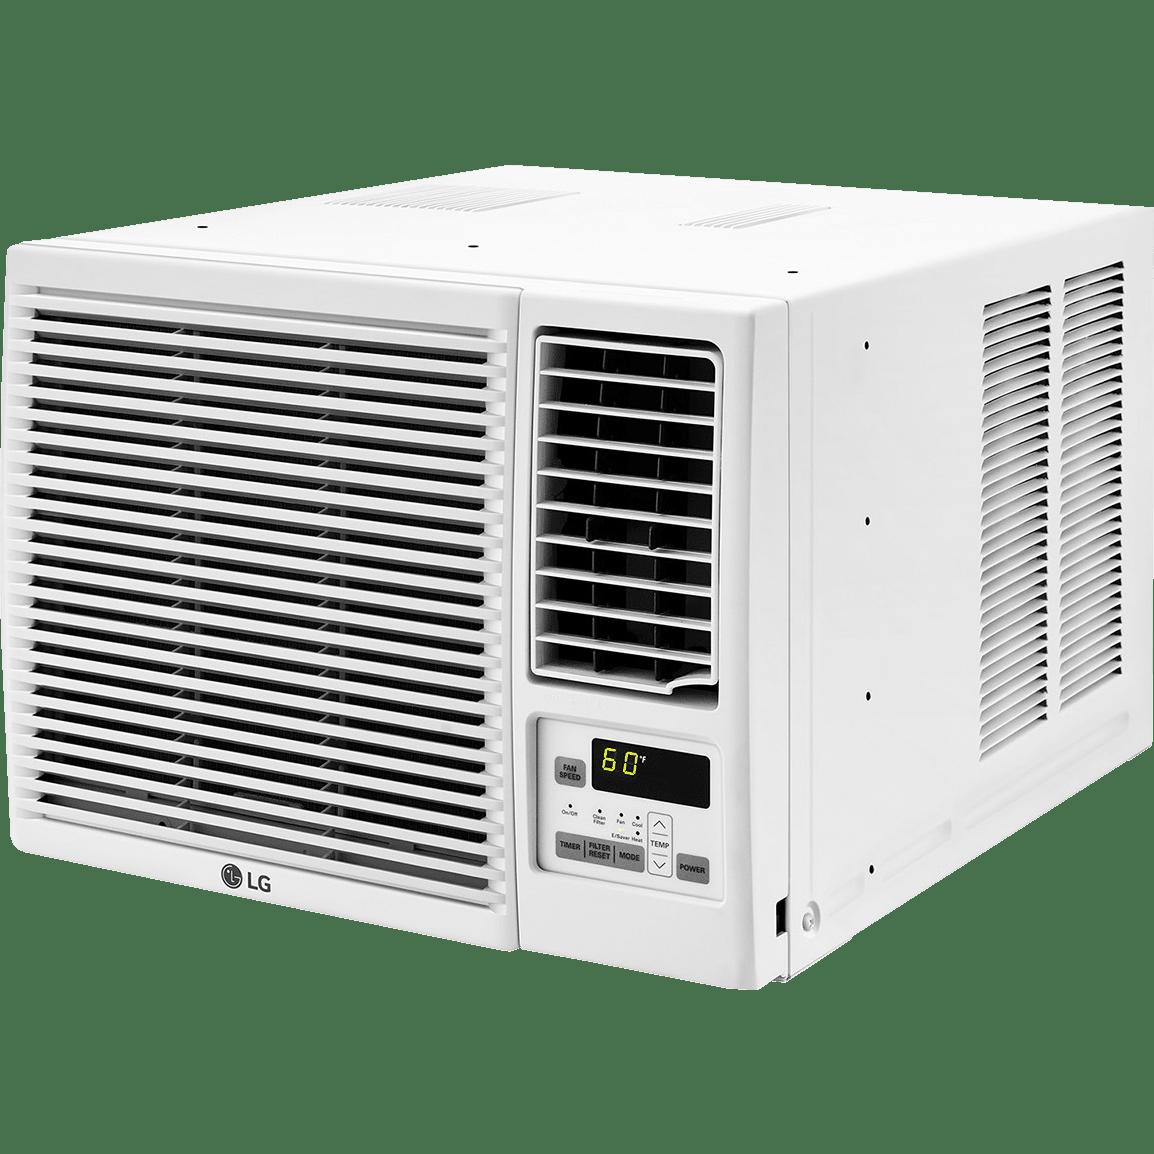 Lg Lw1216hr 12 000 Btu Window Air Conditioner Sylvane